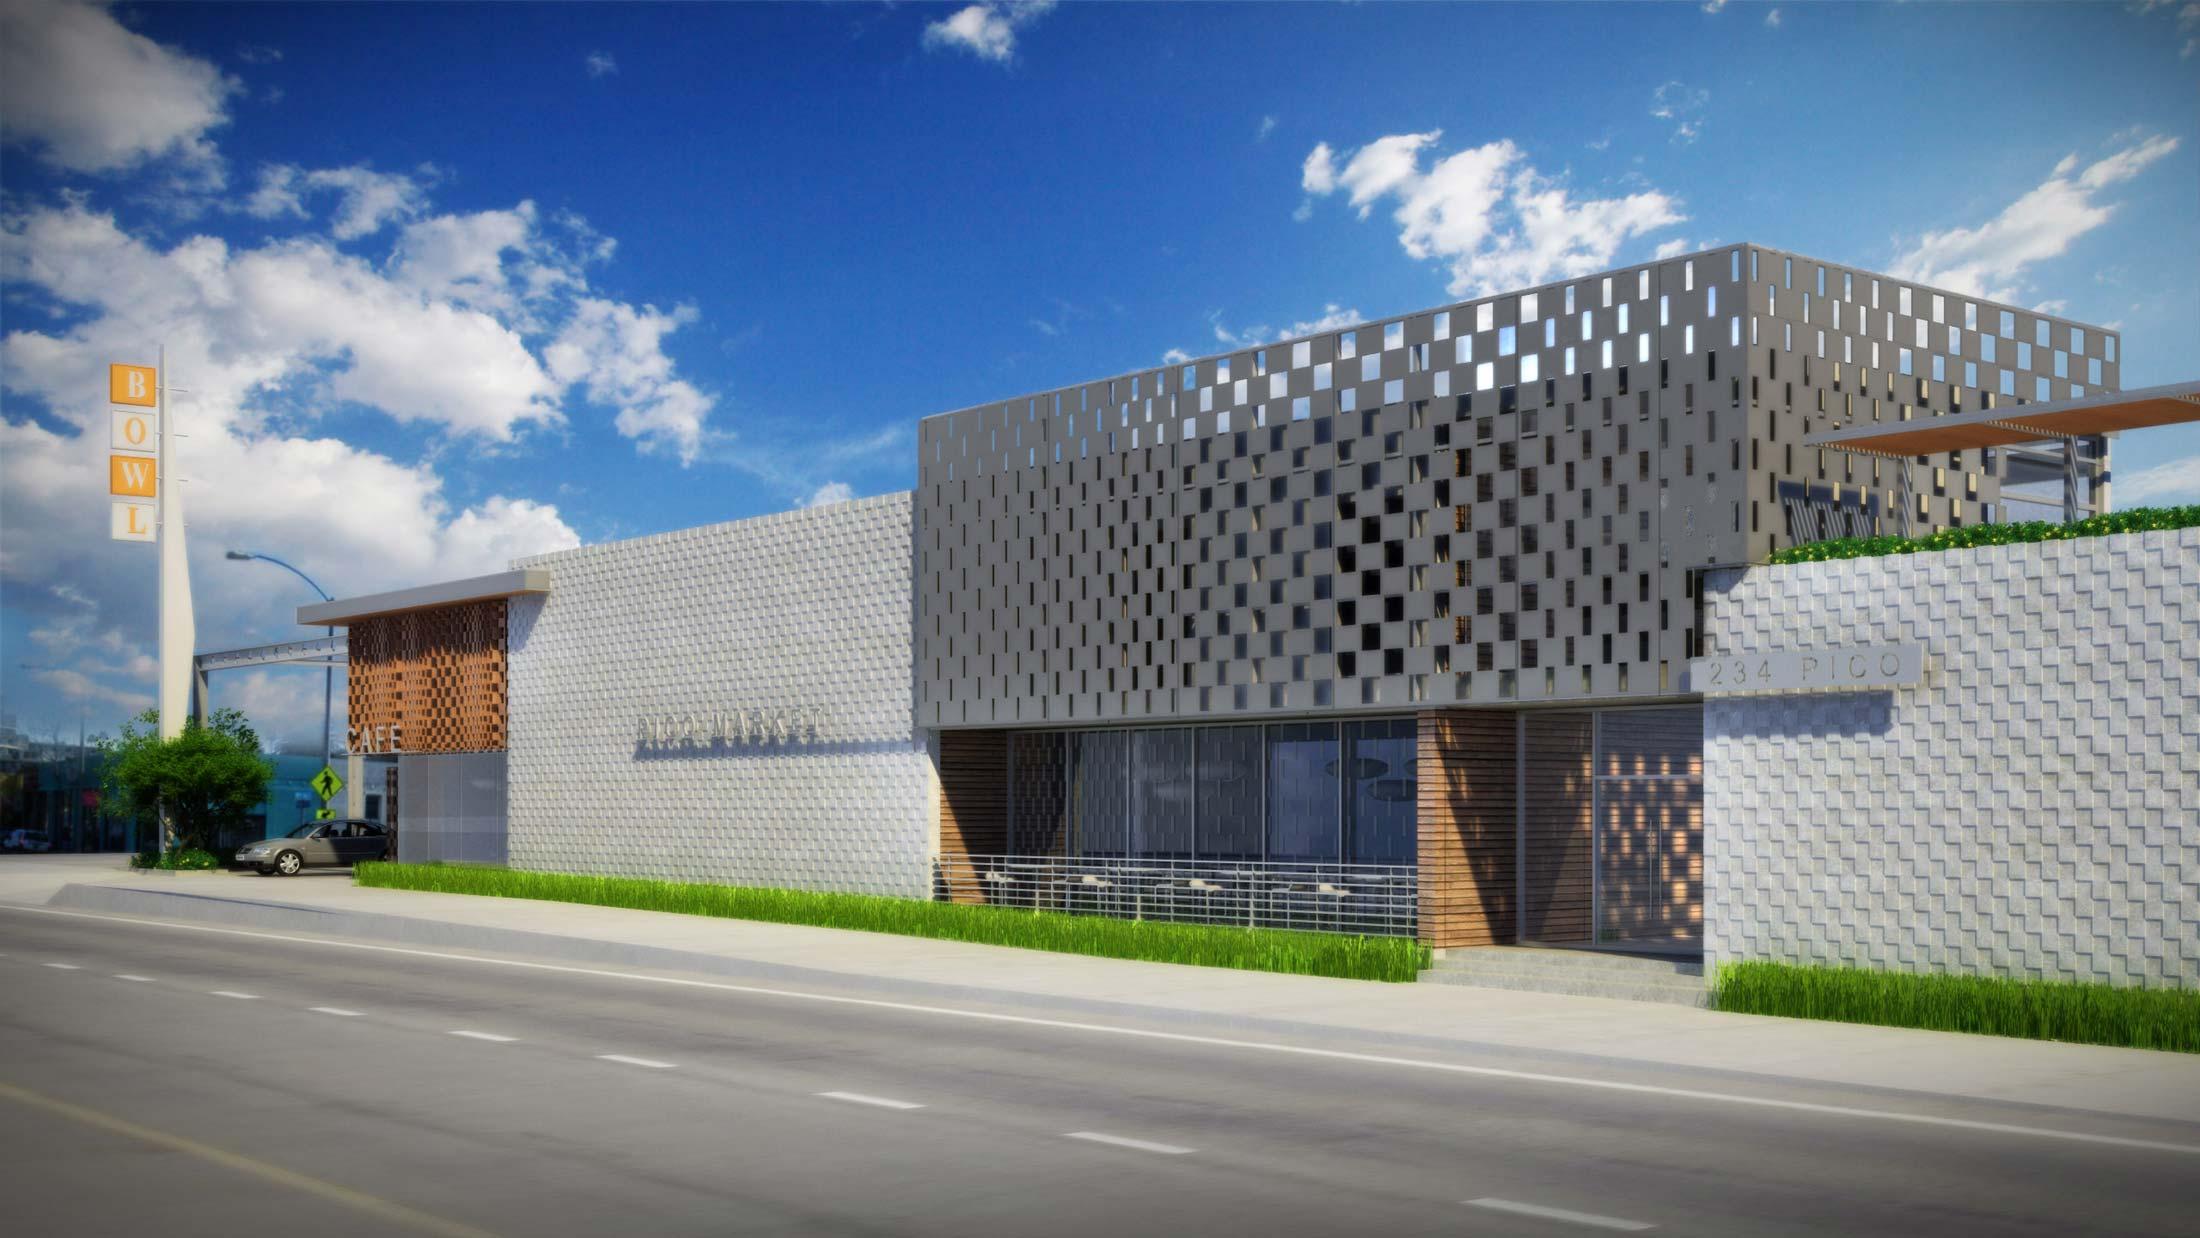 modern-architecture-commercial-building-california-shubindonaldson-picobowl-08